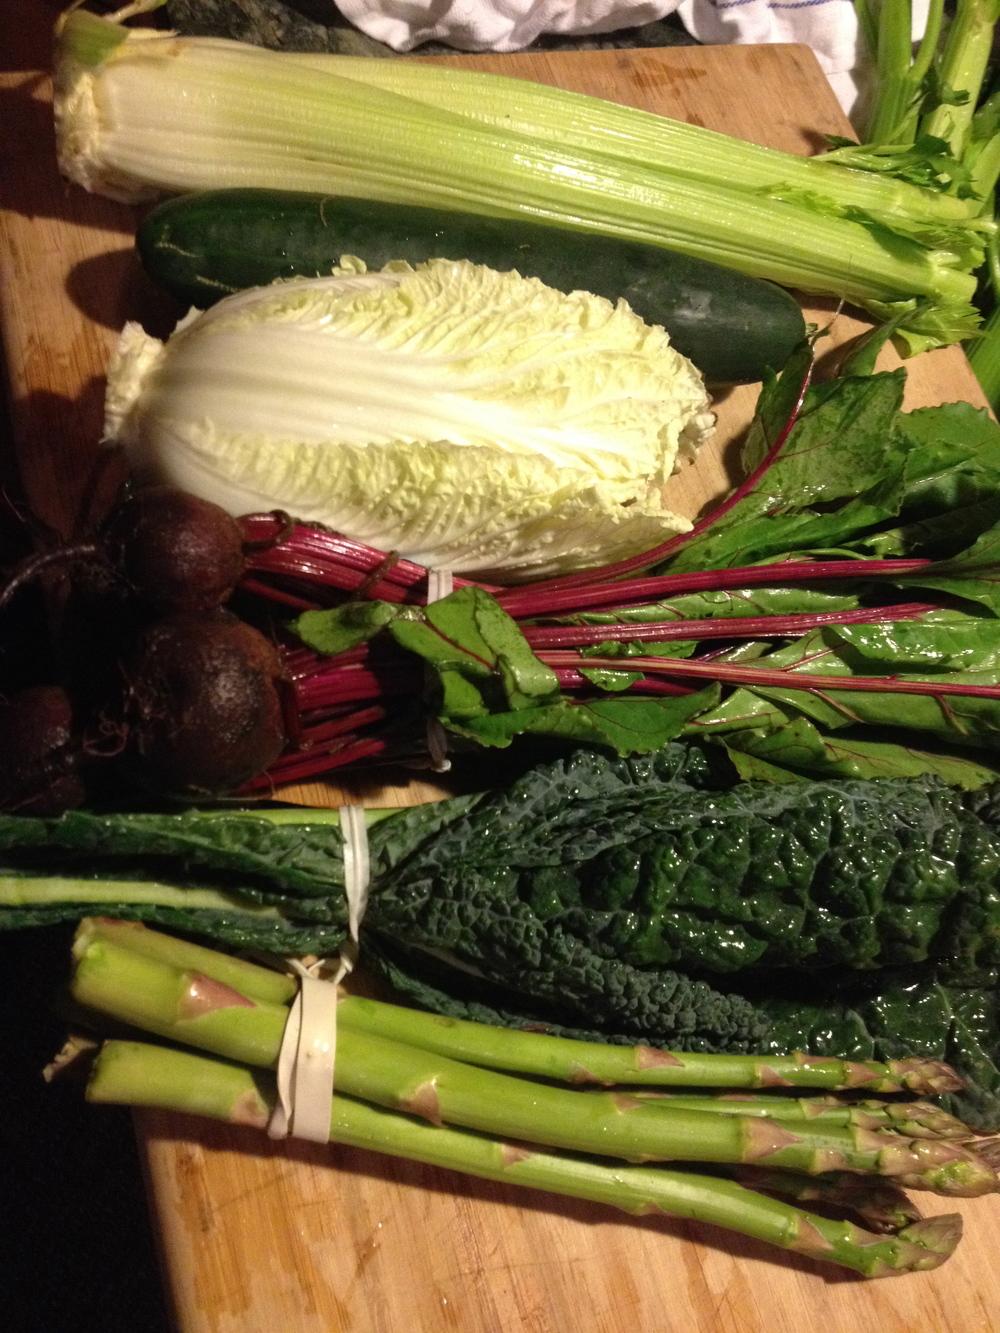 veg on board 1.jpg